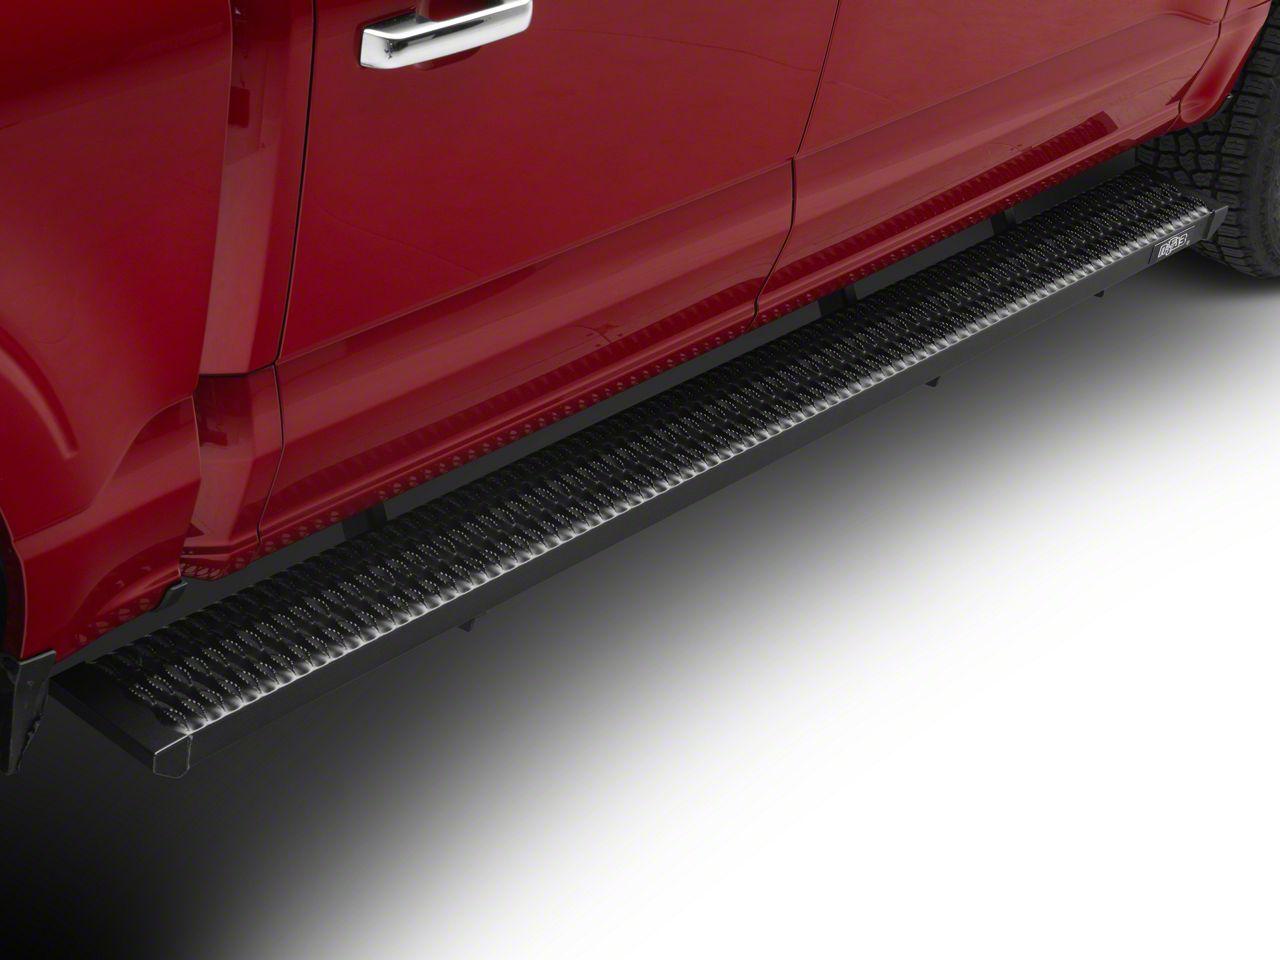 N-Fab Growler Fleet Sure Grip Running Boards - Textured Black (15-19 F-150 SuperCrew)